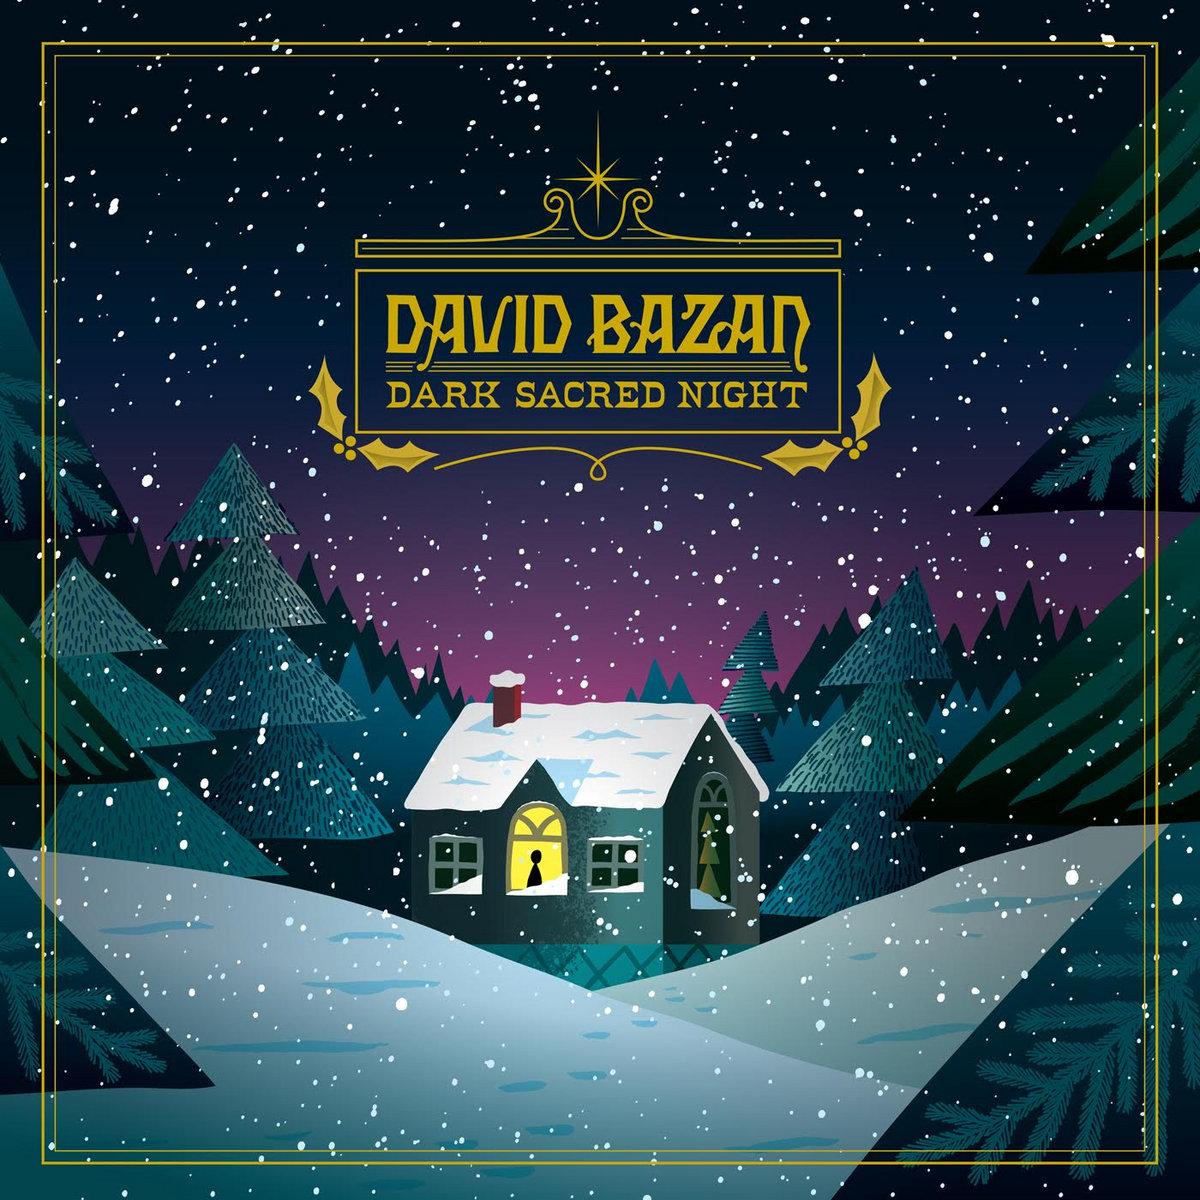 David Bazan - Dark Sacred Night LP